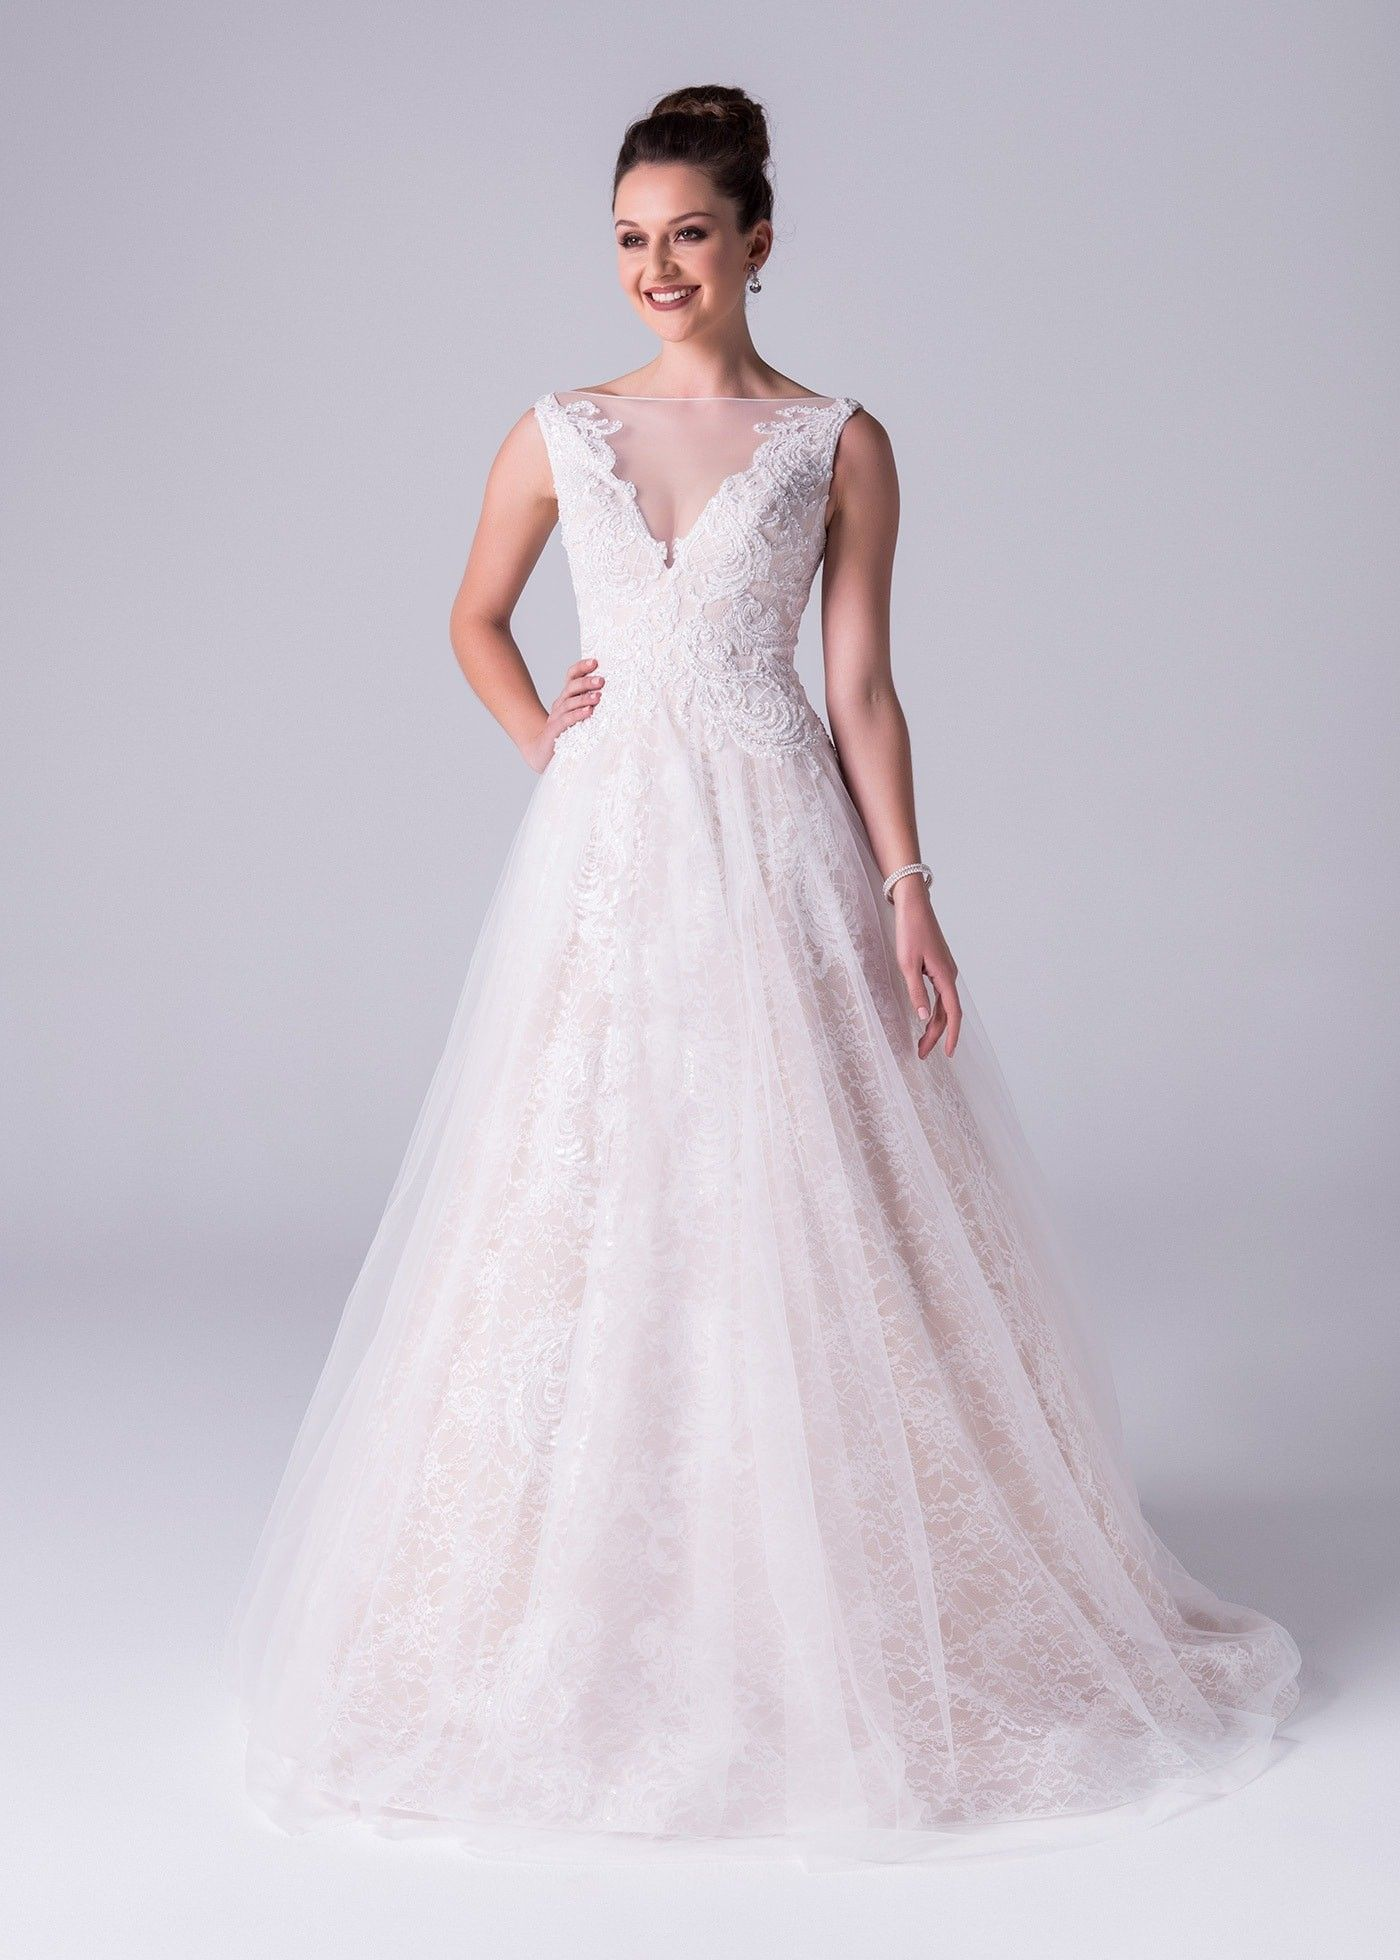 Pin by Nicole Delarue on wedding Wedding dresses